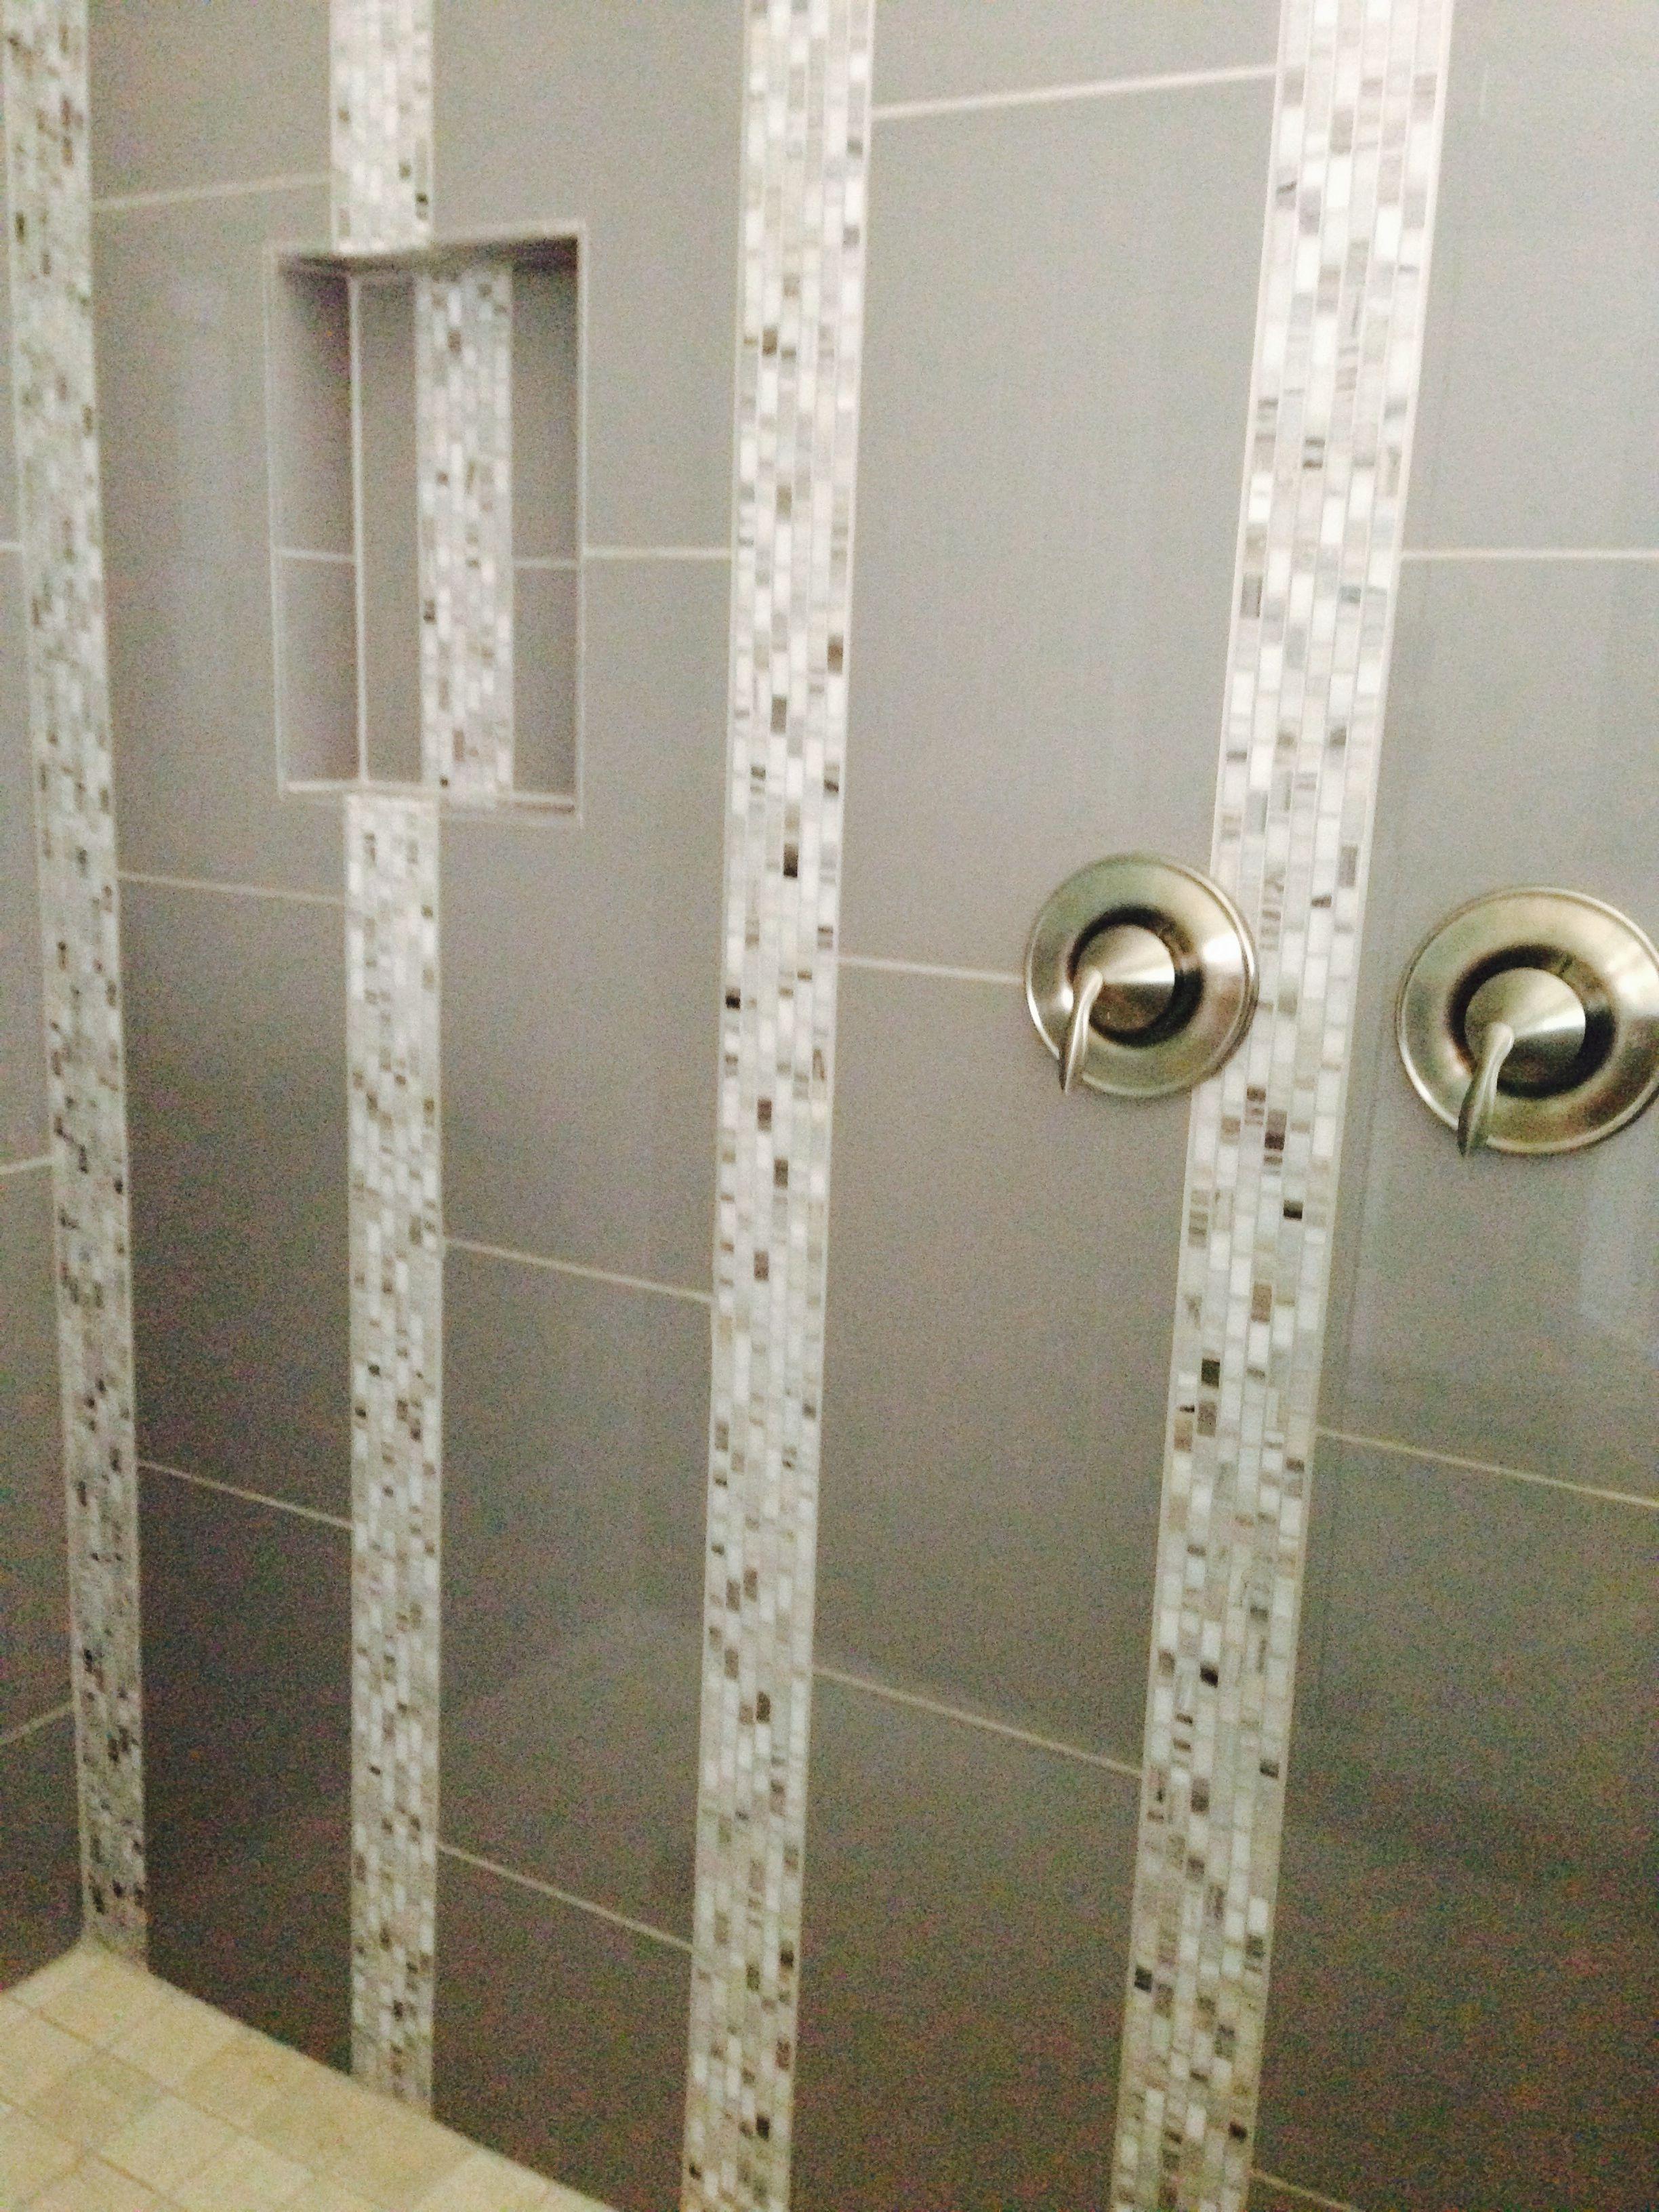 12x24 high gloss porcelain tile with decorative mosaic tile accent ...